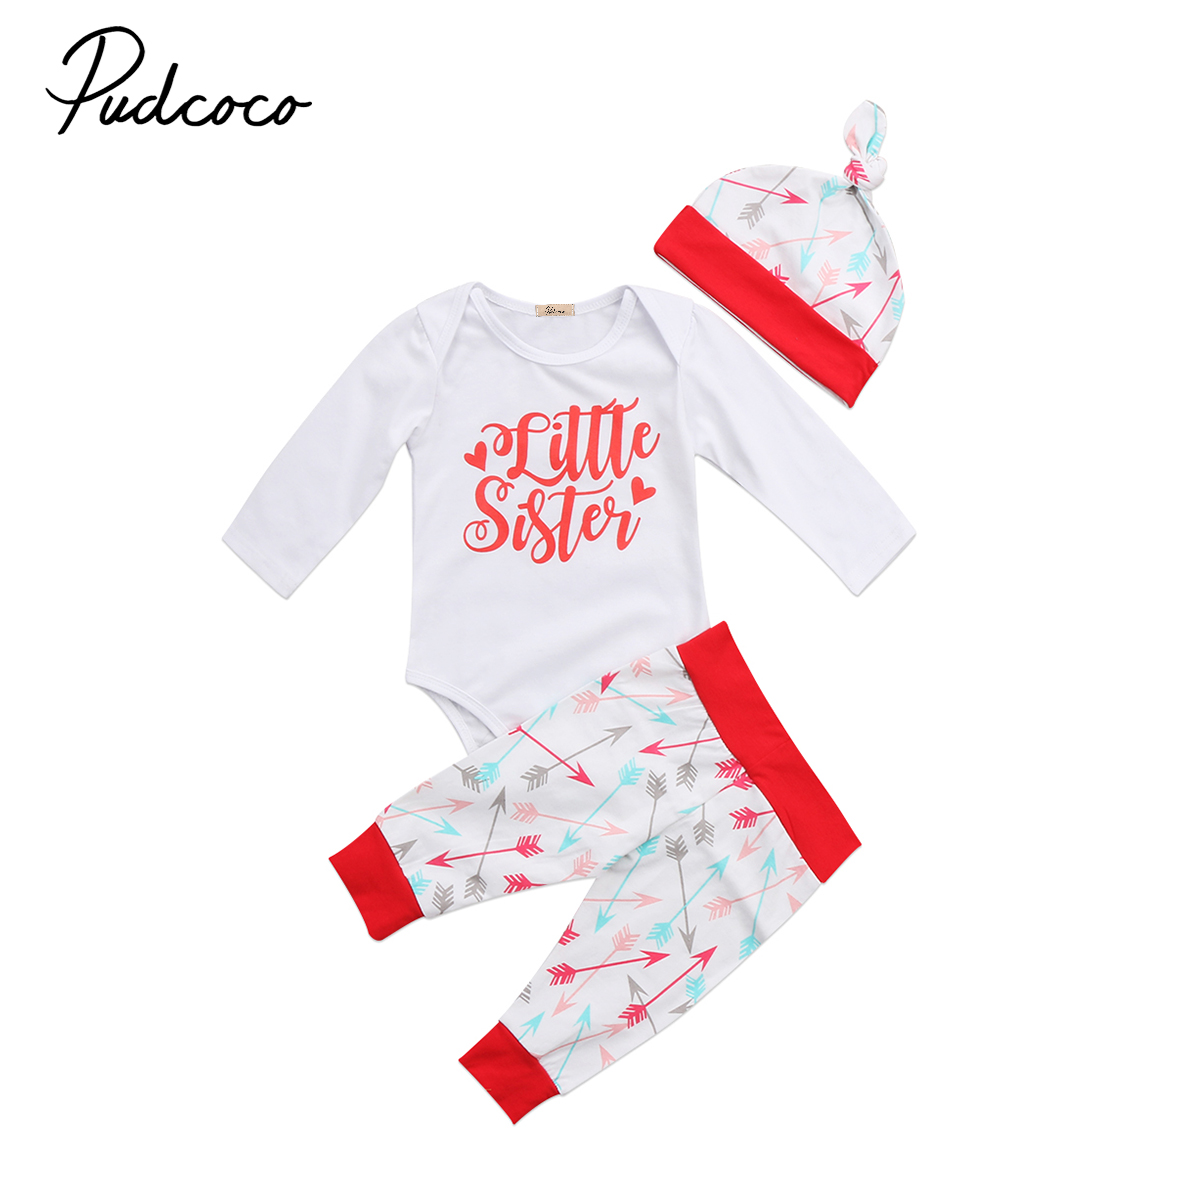 Newborn Infant Baby Girls Cotton Tops Romper Leggings Pants Hat 3Pcs Outfits Set Toddler Girl Little Sister Winter Clothes